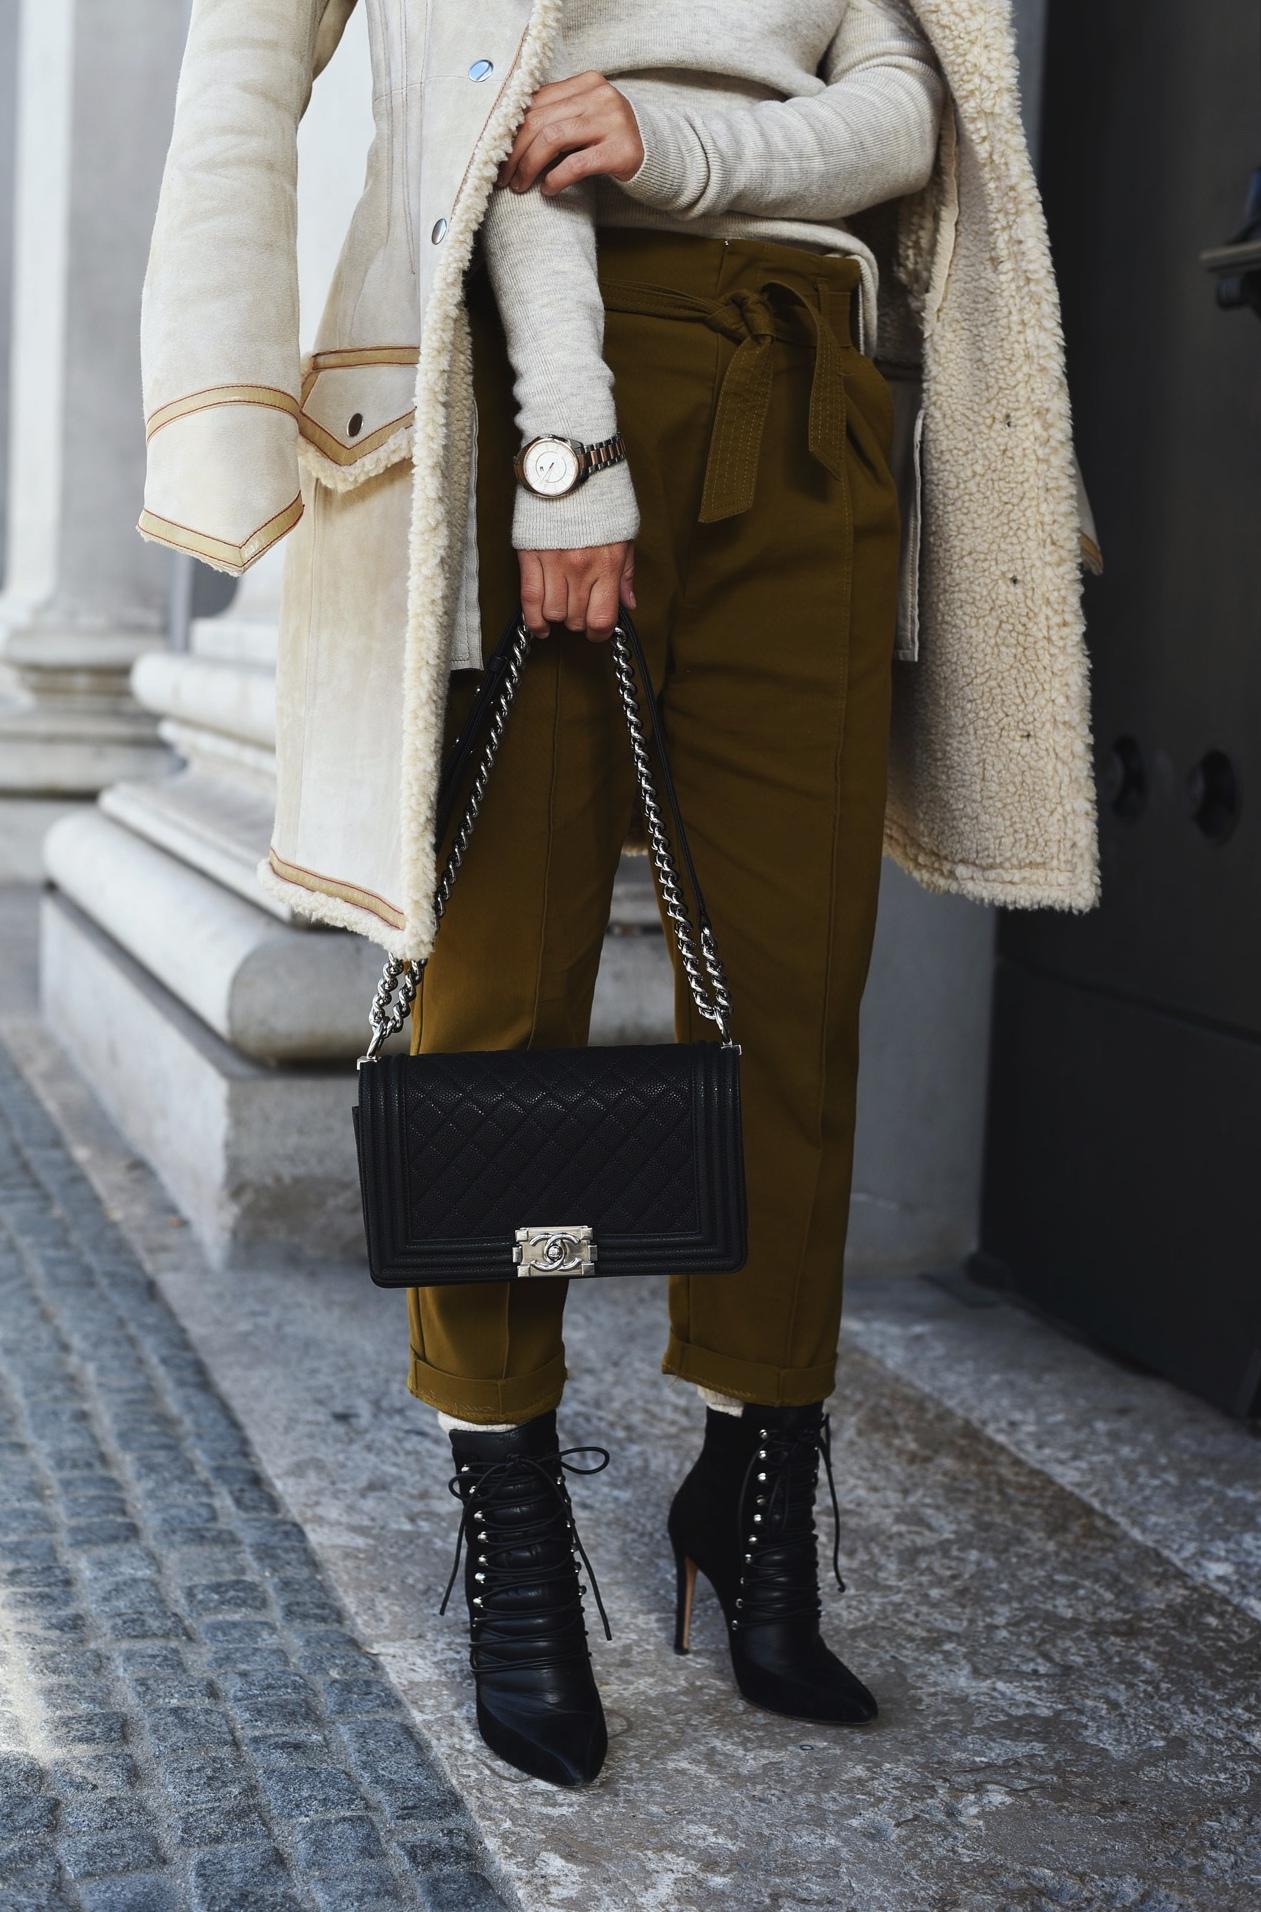 chanel-boy-bag-medium-kaviar-leder-schwarz-altes-modell-blogger-streetstyle-nina-fashiioncarpet